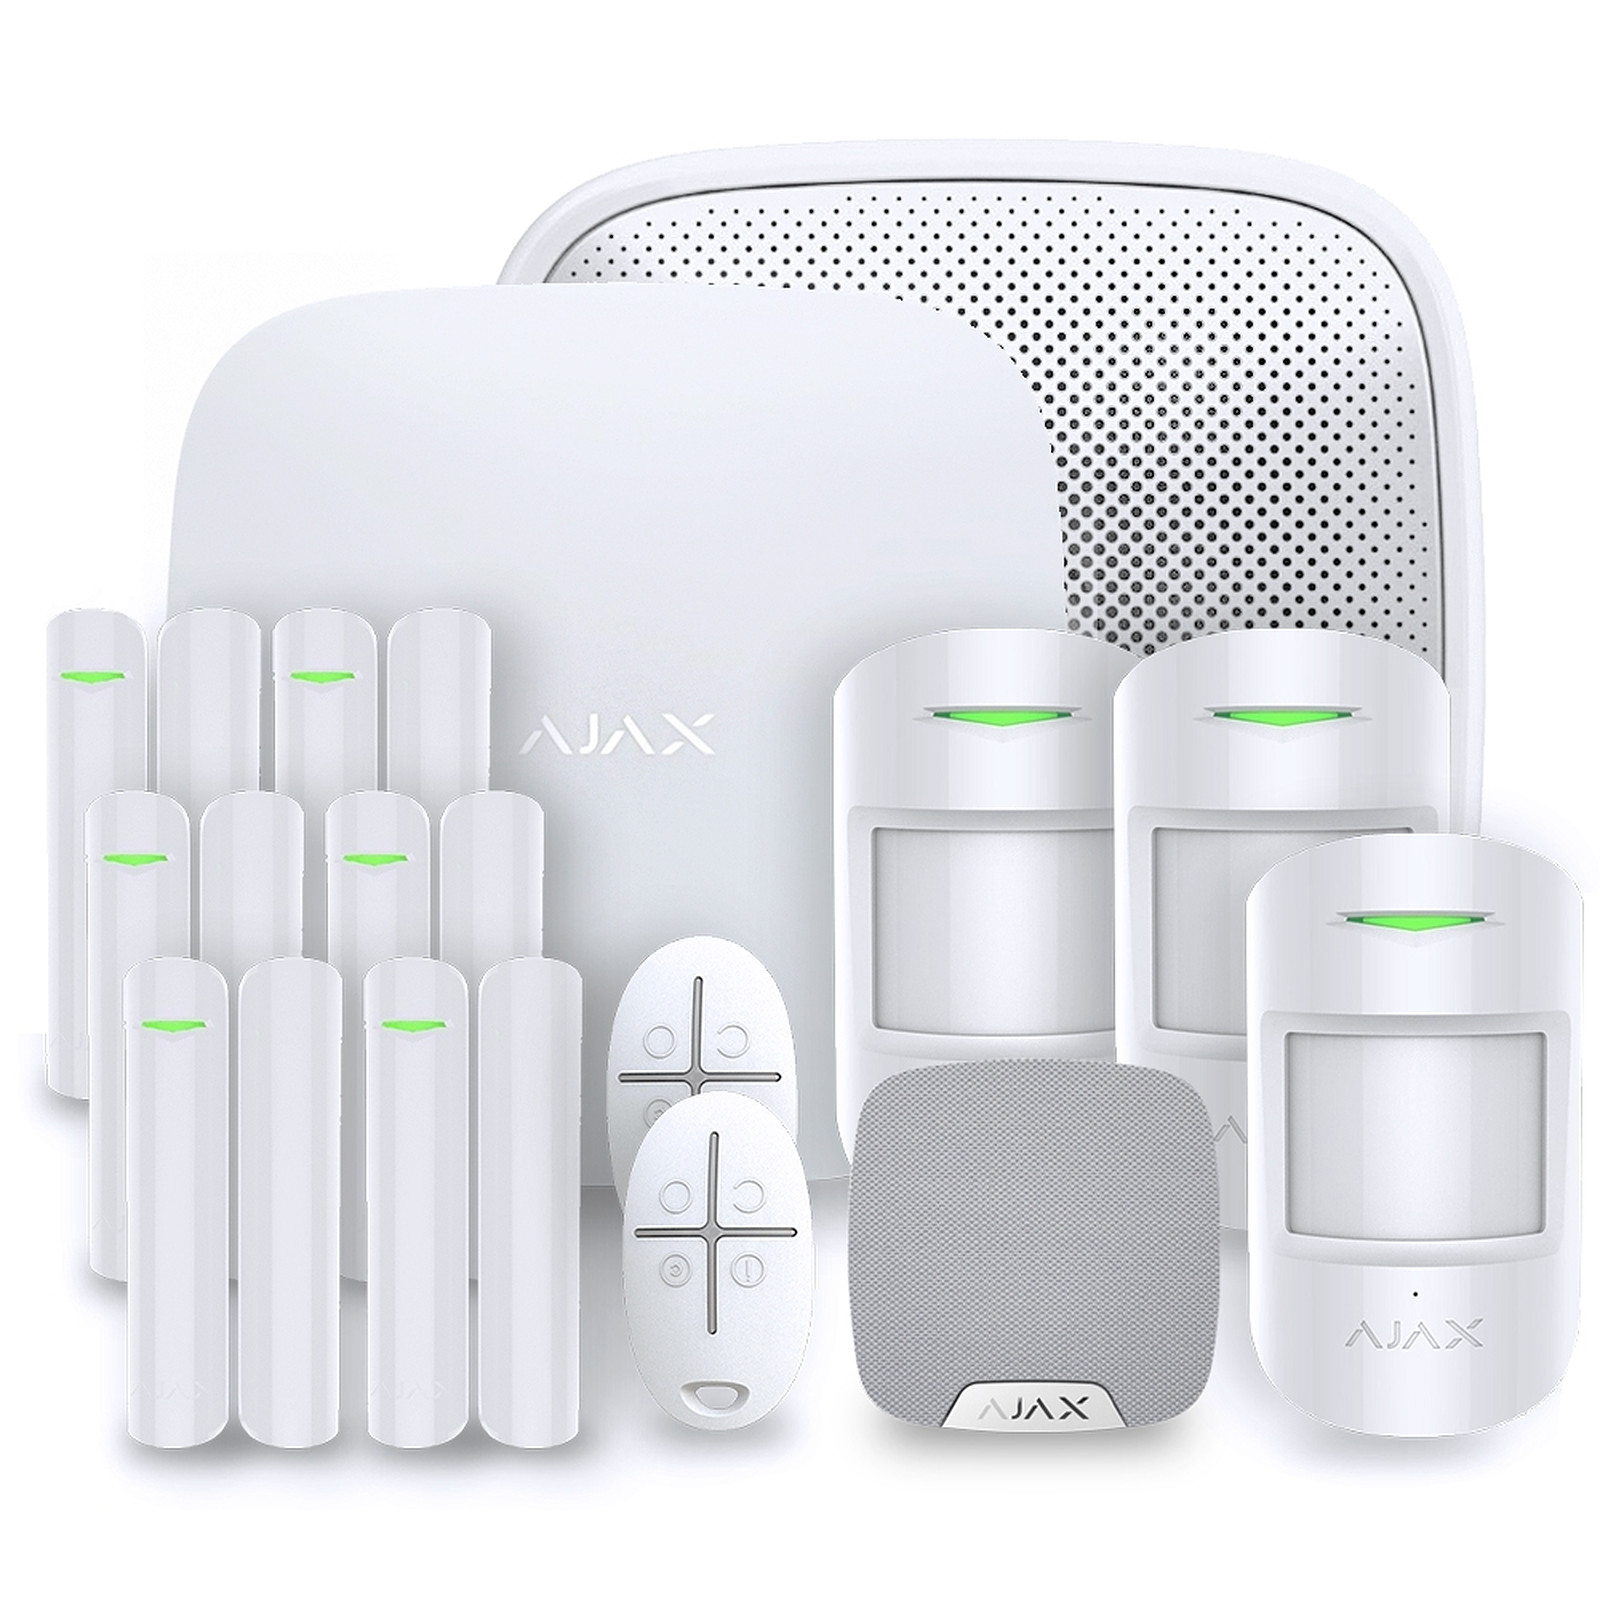 Ajax Alarme maison StarterKit blanc  Kit 5